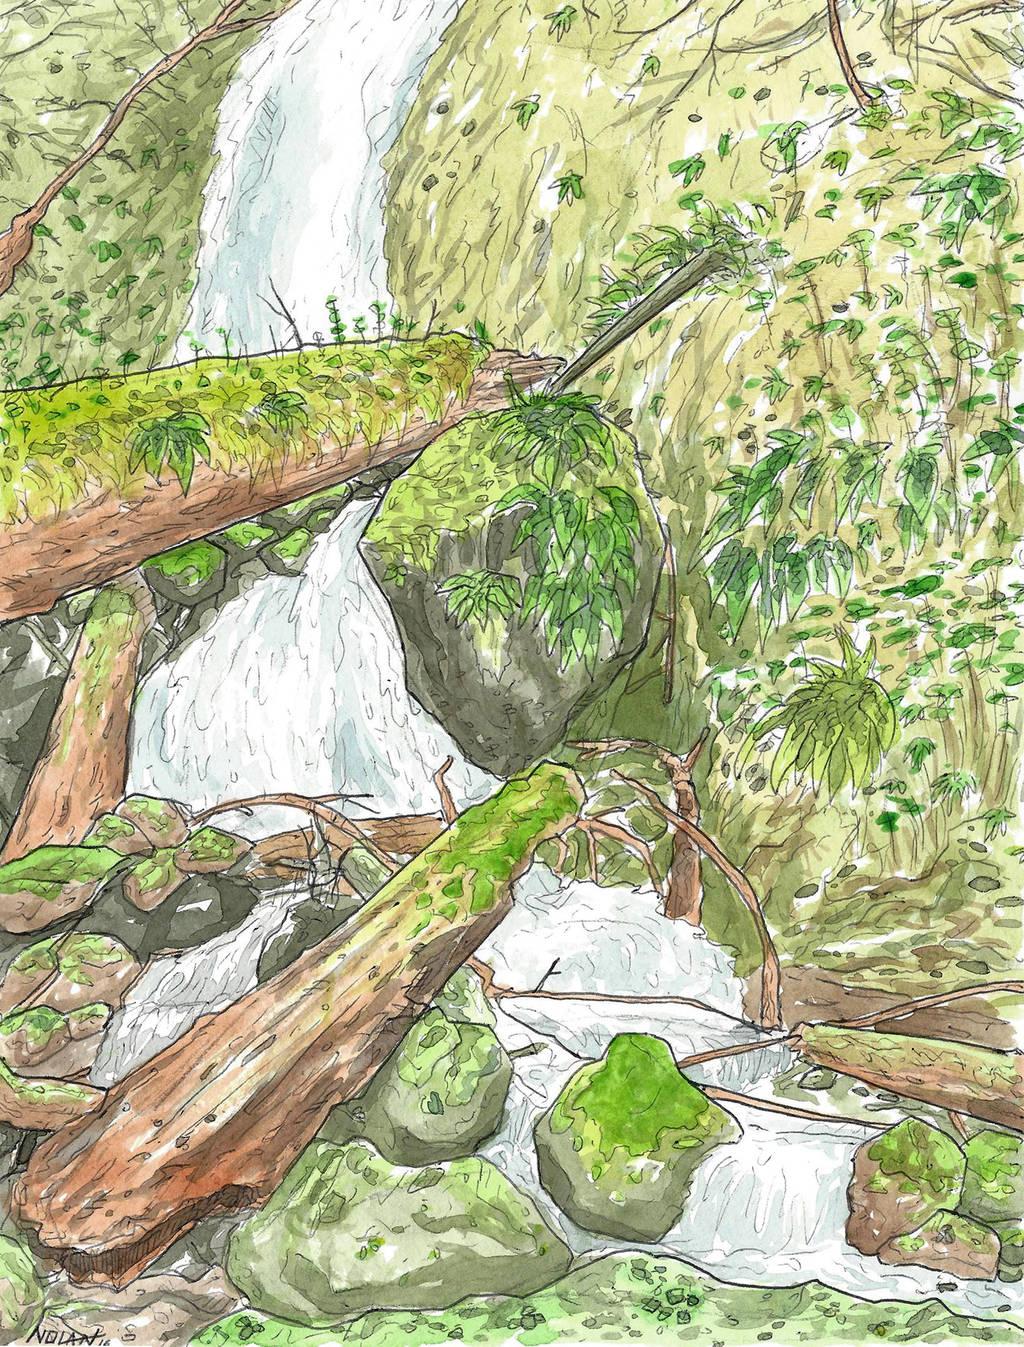 Quiet Quinault by Llewxam888